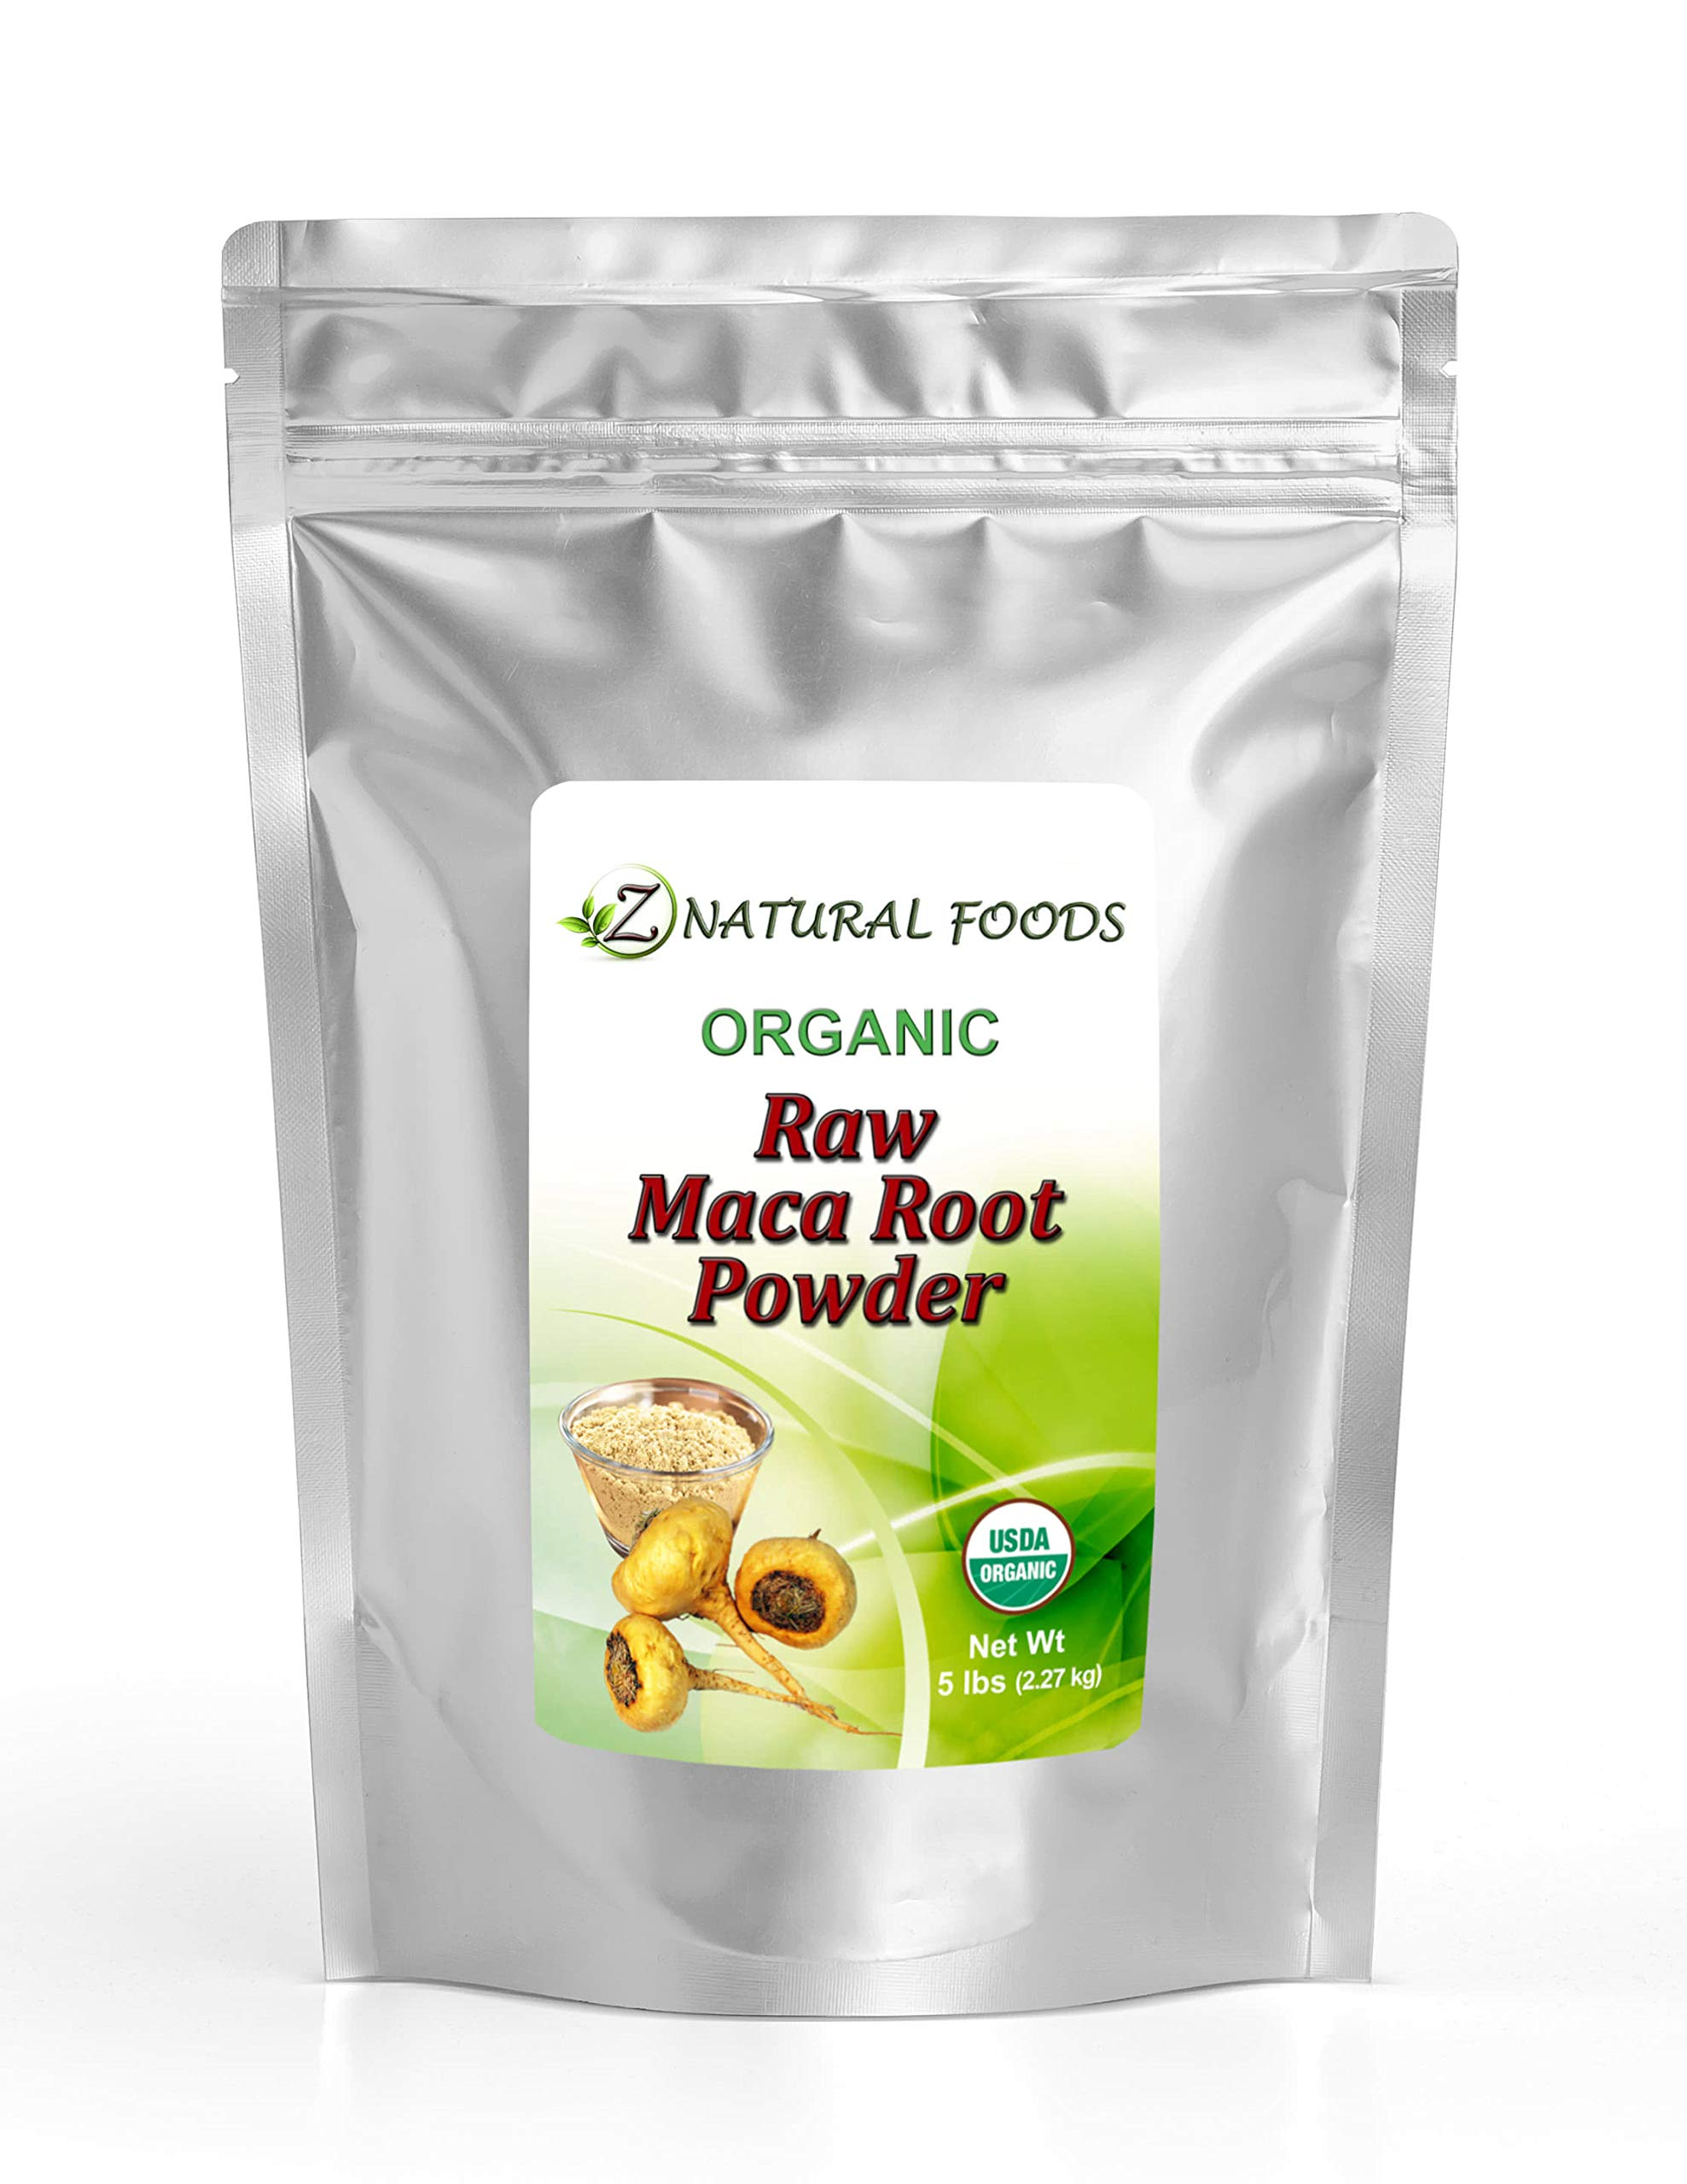 Organic Maca Root Powder - Bulk 5 lb Size - Adaptogen Superfood Supplement - Red, Yellow & Black Blend Grown In Peru - Mix In Drinks, Juice, Smoothies, & Recipes - Raw, Vegan, Non GMO, Gluten Free